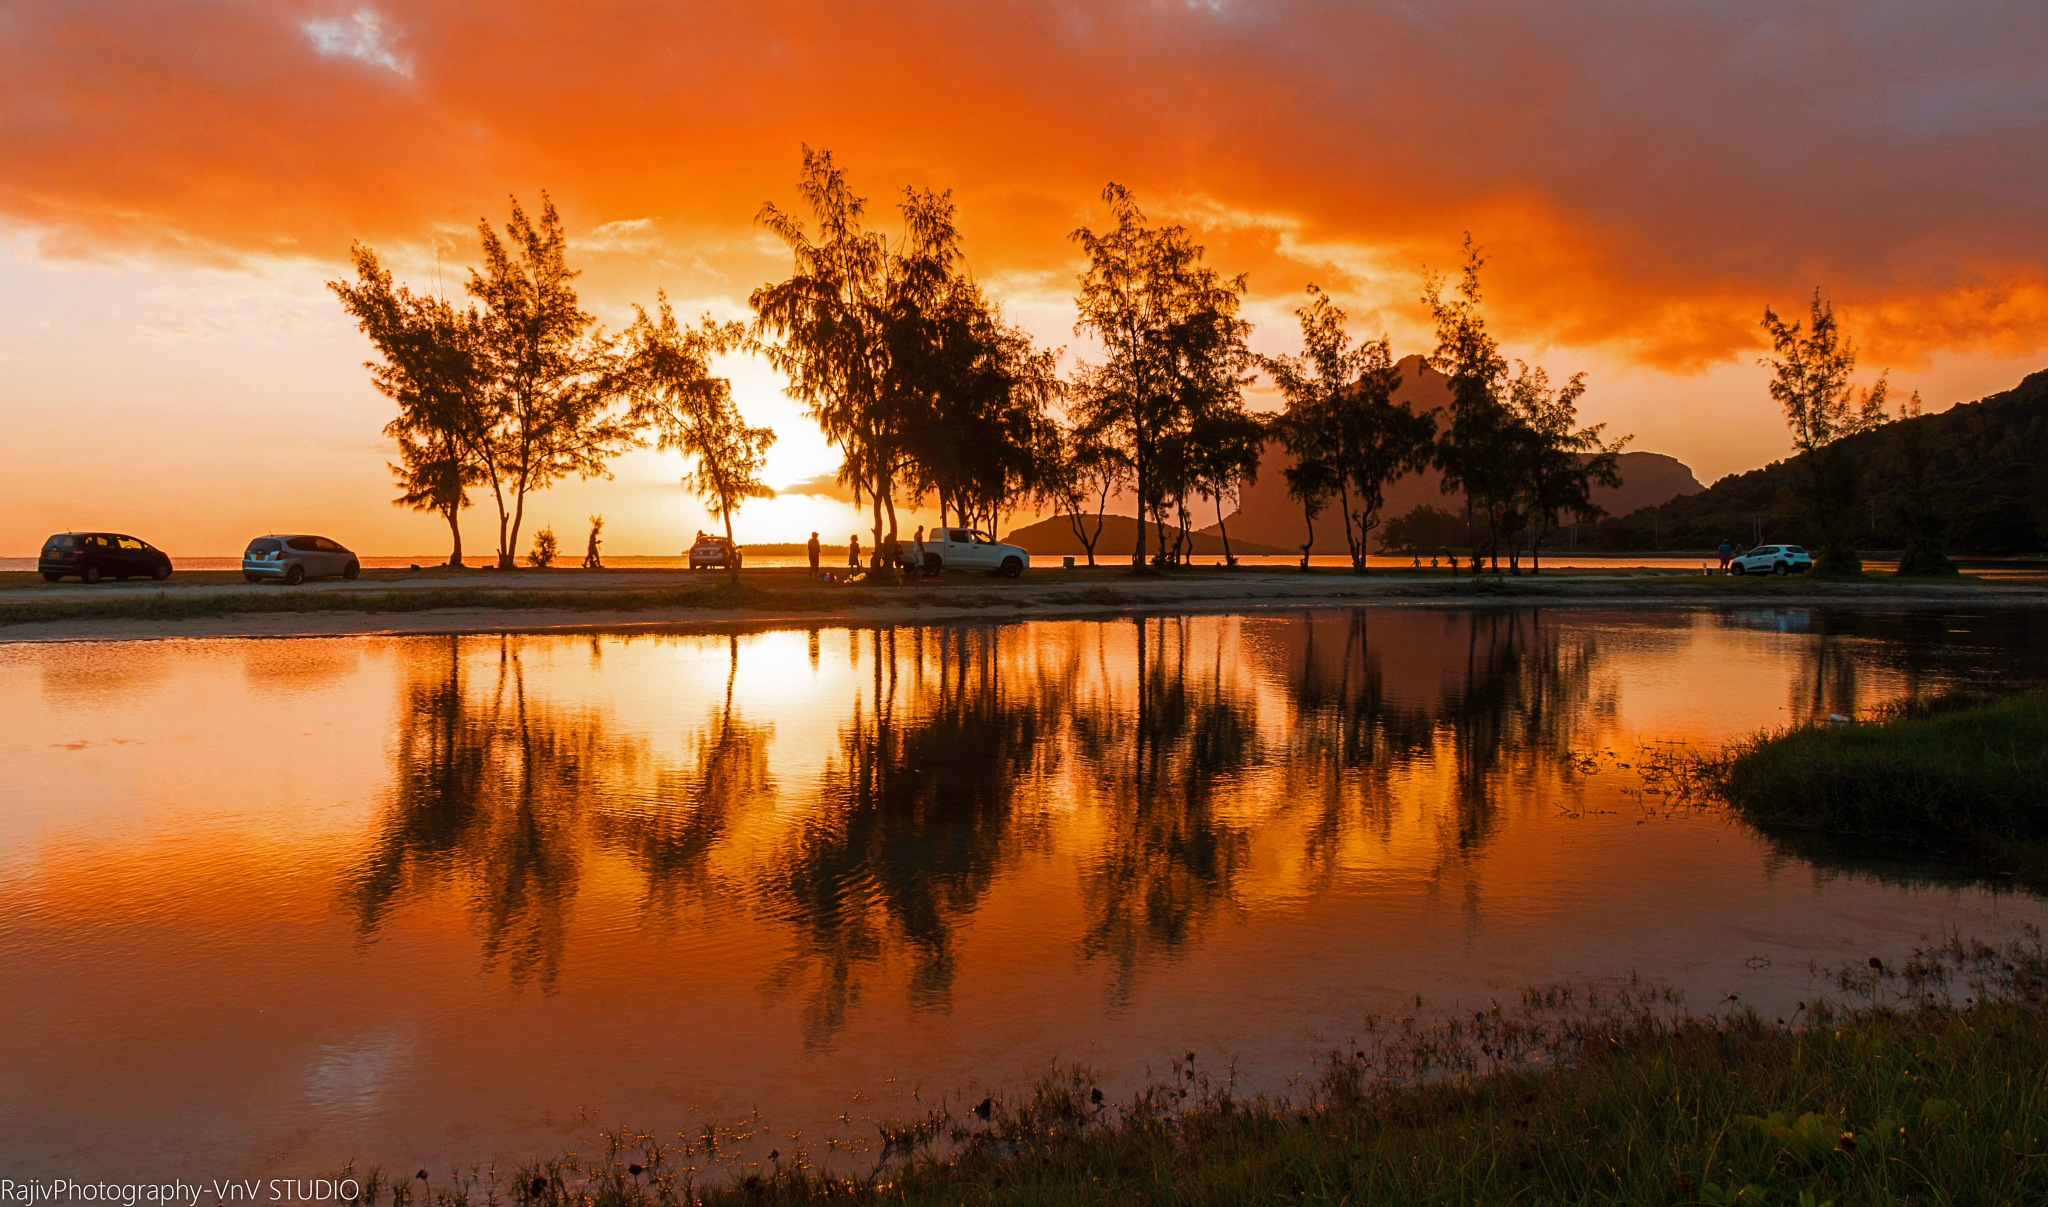 Sunset Moment by RajivPhotography